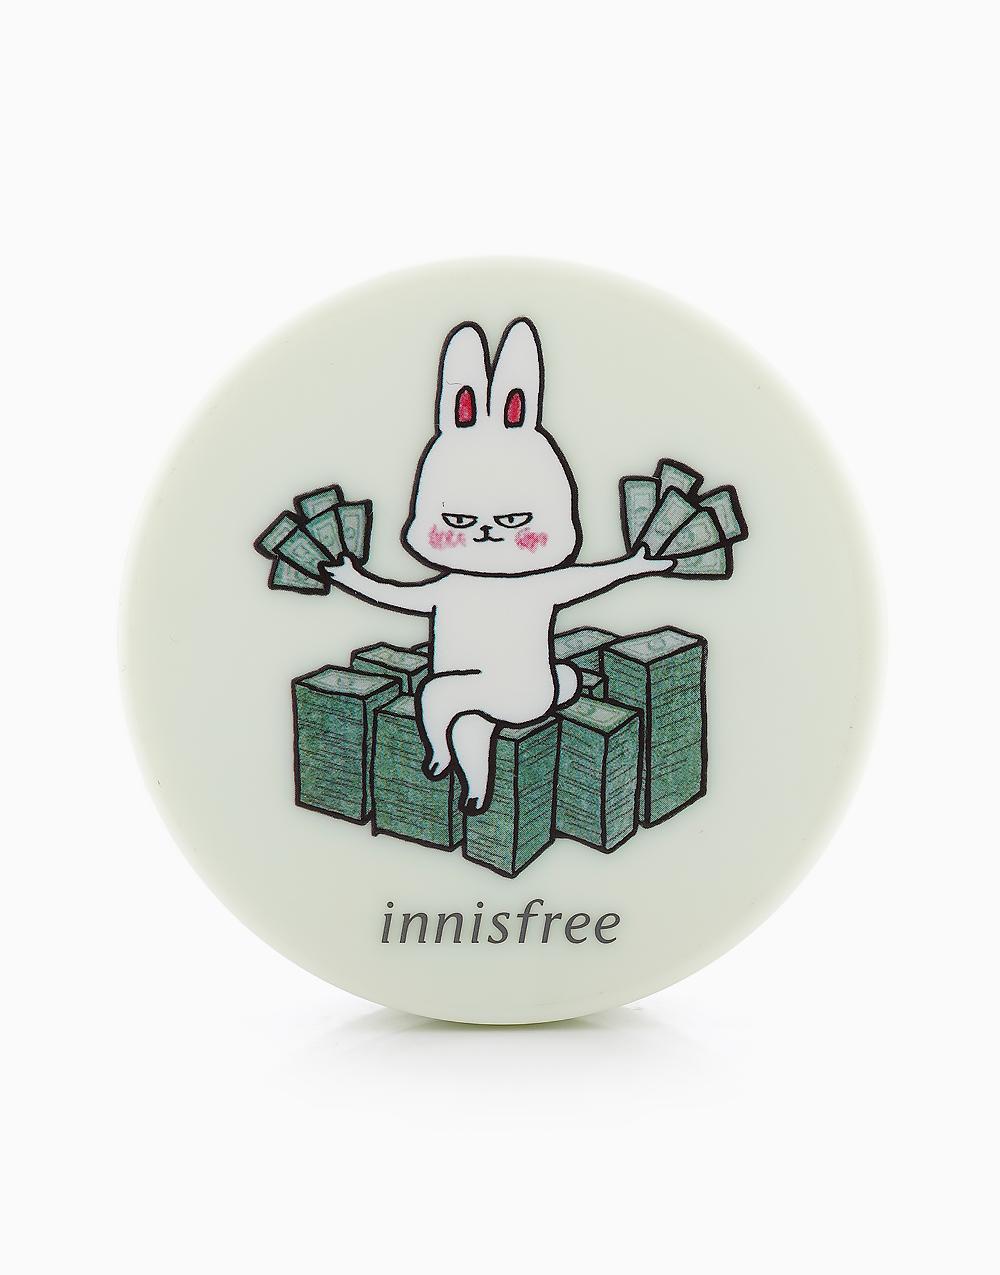 No Sebum Mineral Powder Happy Bunny Edition (5g) by Innisfree | #7 Crazy Rich Bunny